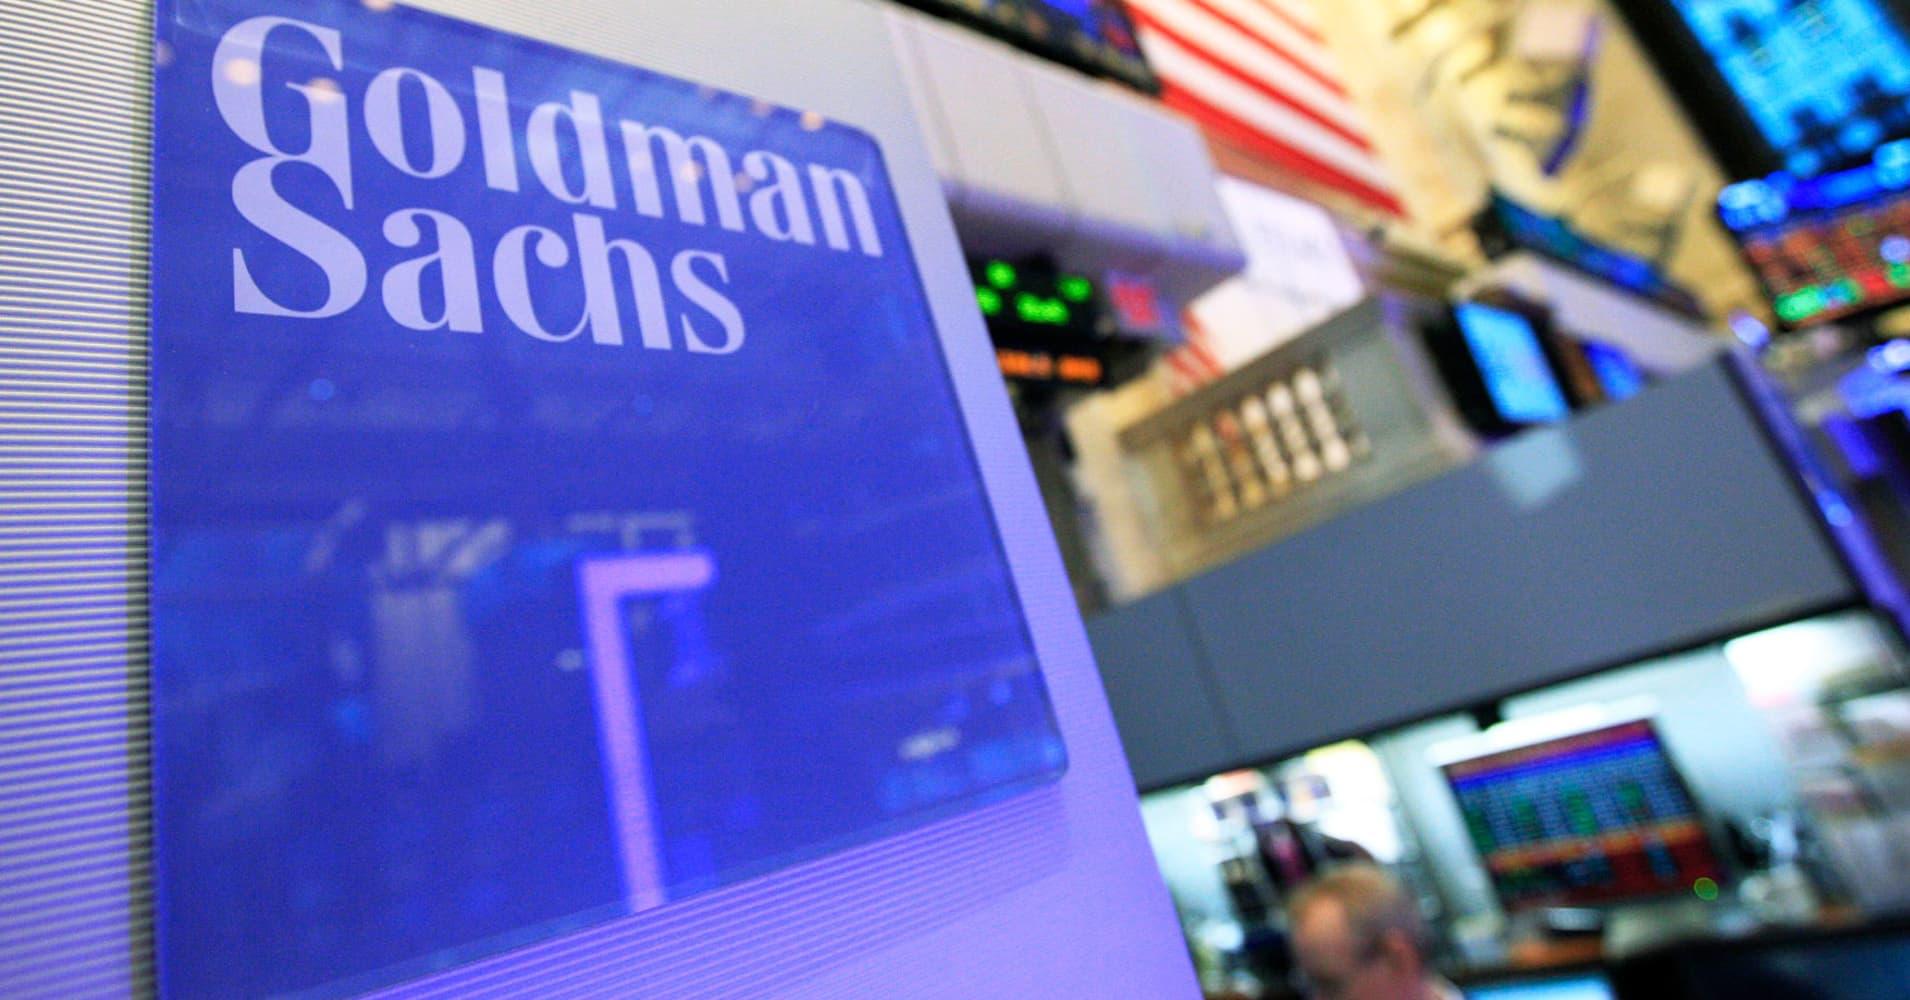 Goldman Sachs begins to thin ranks at partner level